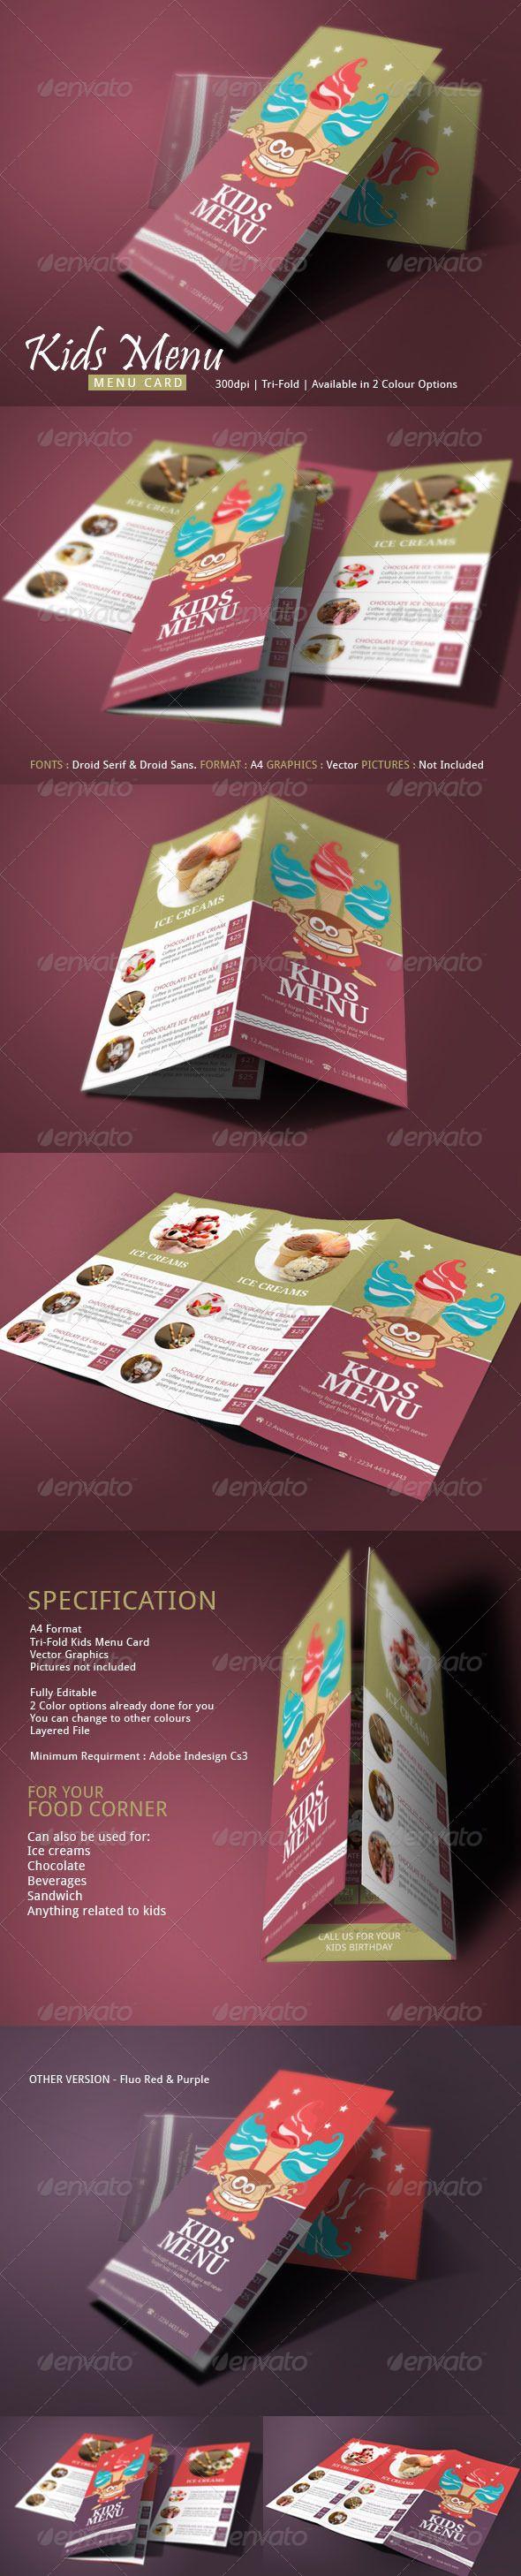 Kids Menu Template #design #speisekarte Download: http://graphicriver.net/item/kids-menu/7637566?ref=ksioks